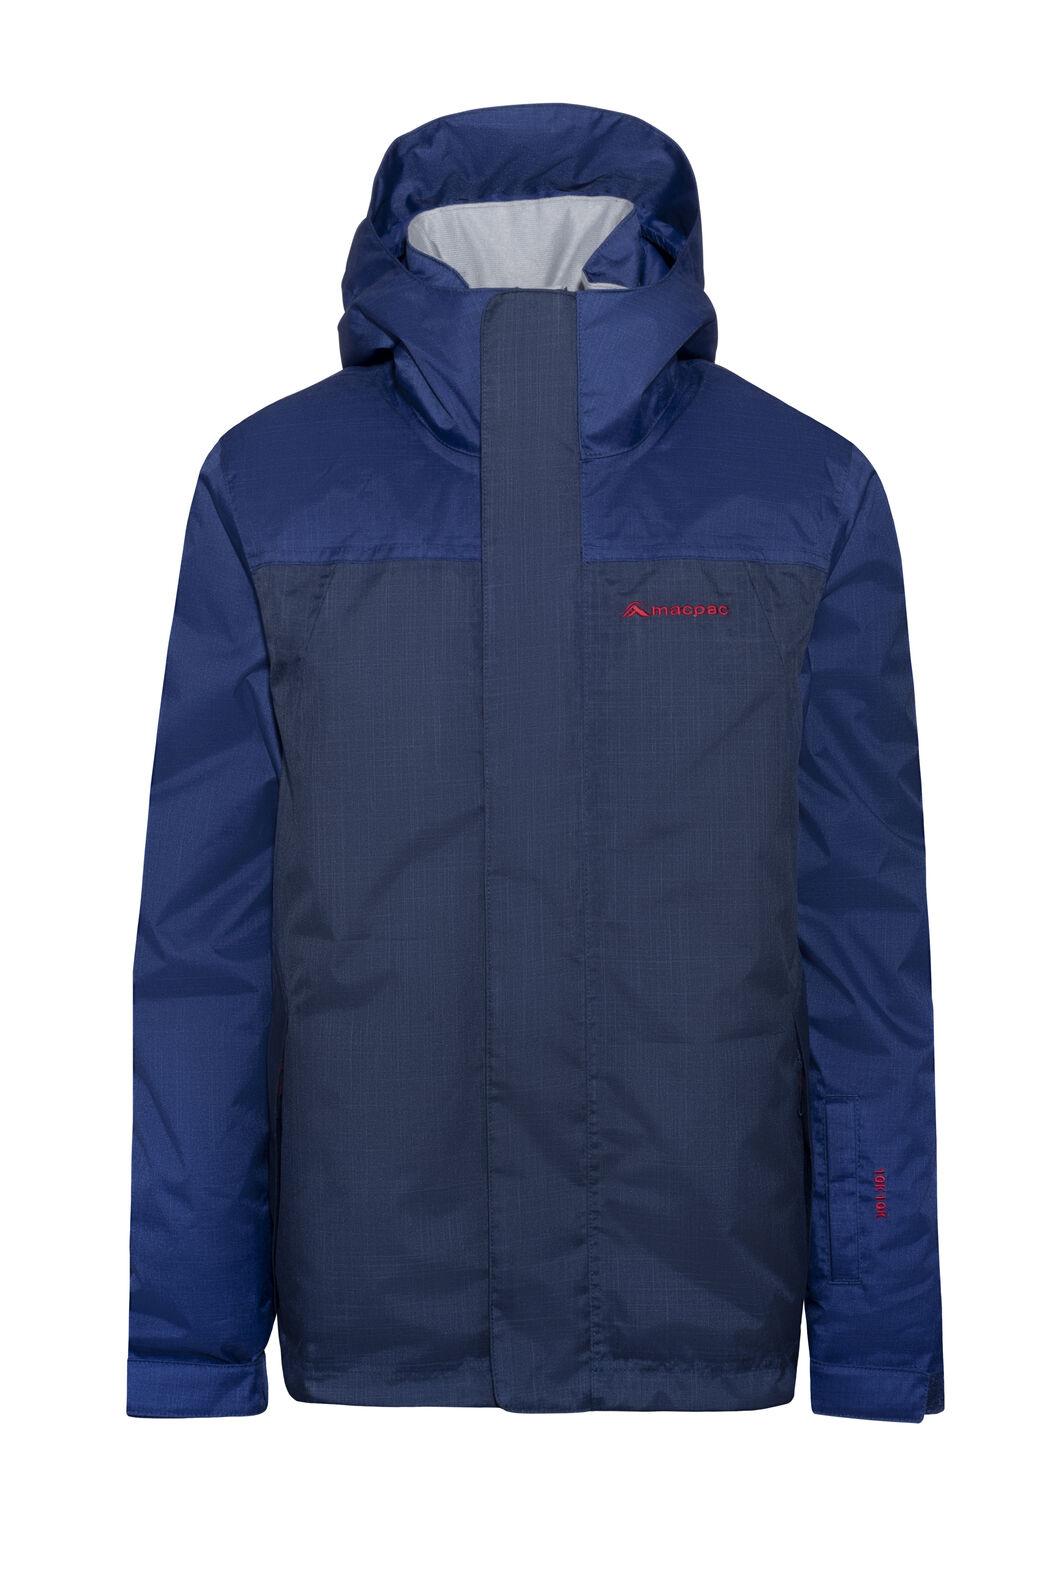 Macpac Spree Reflex™ Ski Jacket — Kids', Blueprint/Black Iris, hi-res